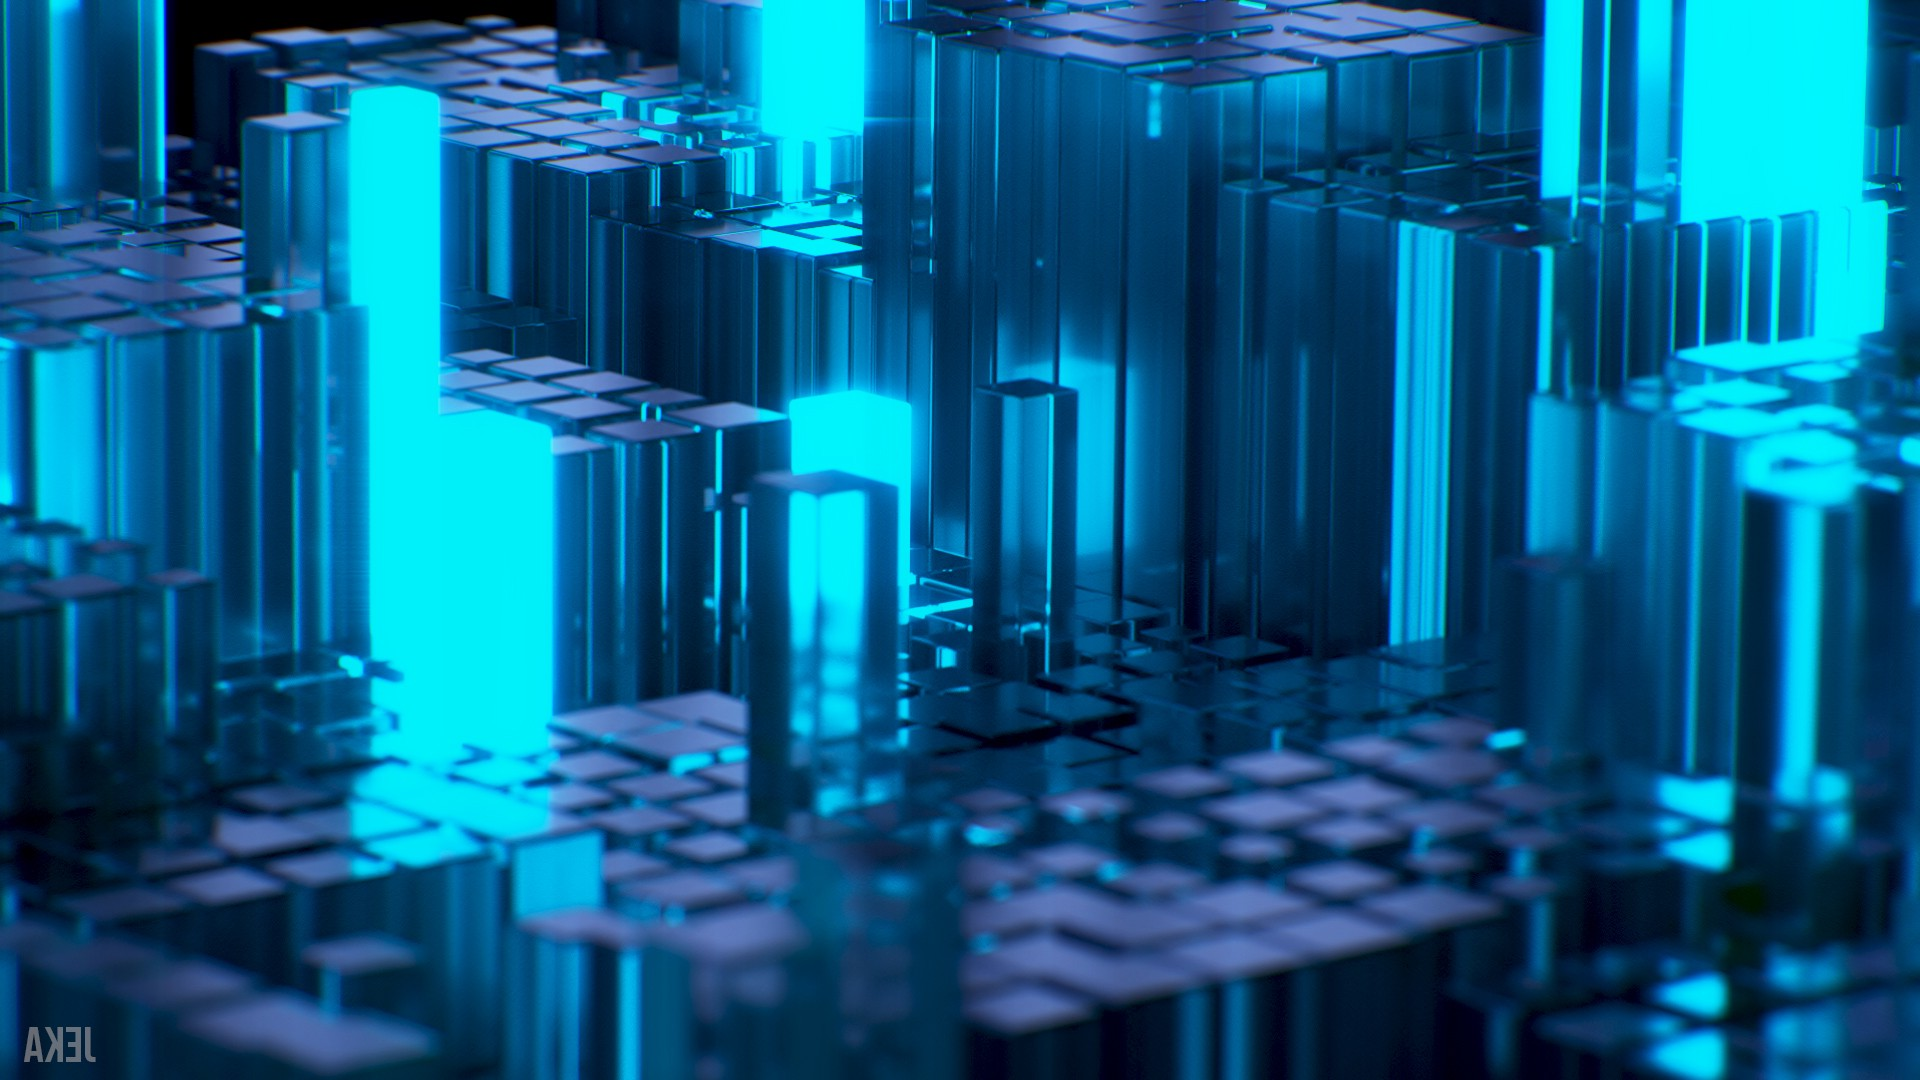 3d Wallpaper For Kitchen デスクトップ壁紙 抽象 3d 青 ガラス 技術 Cinema 4d ブレンダー 大都市 光